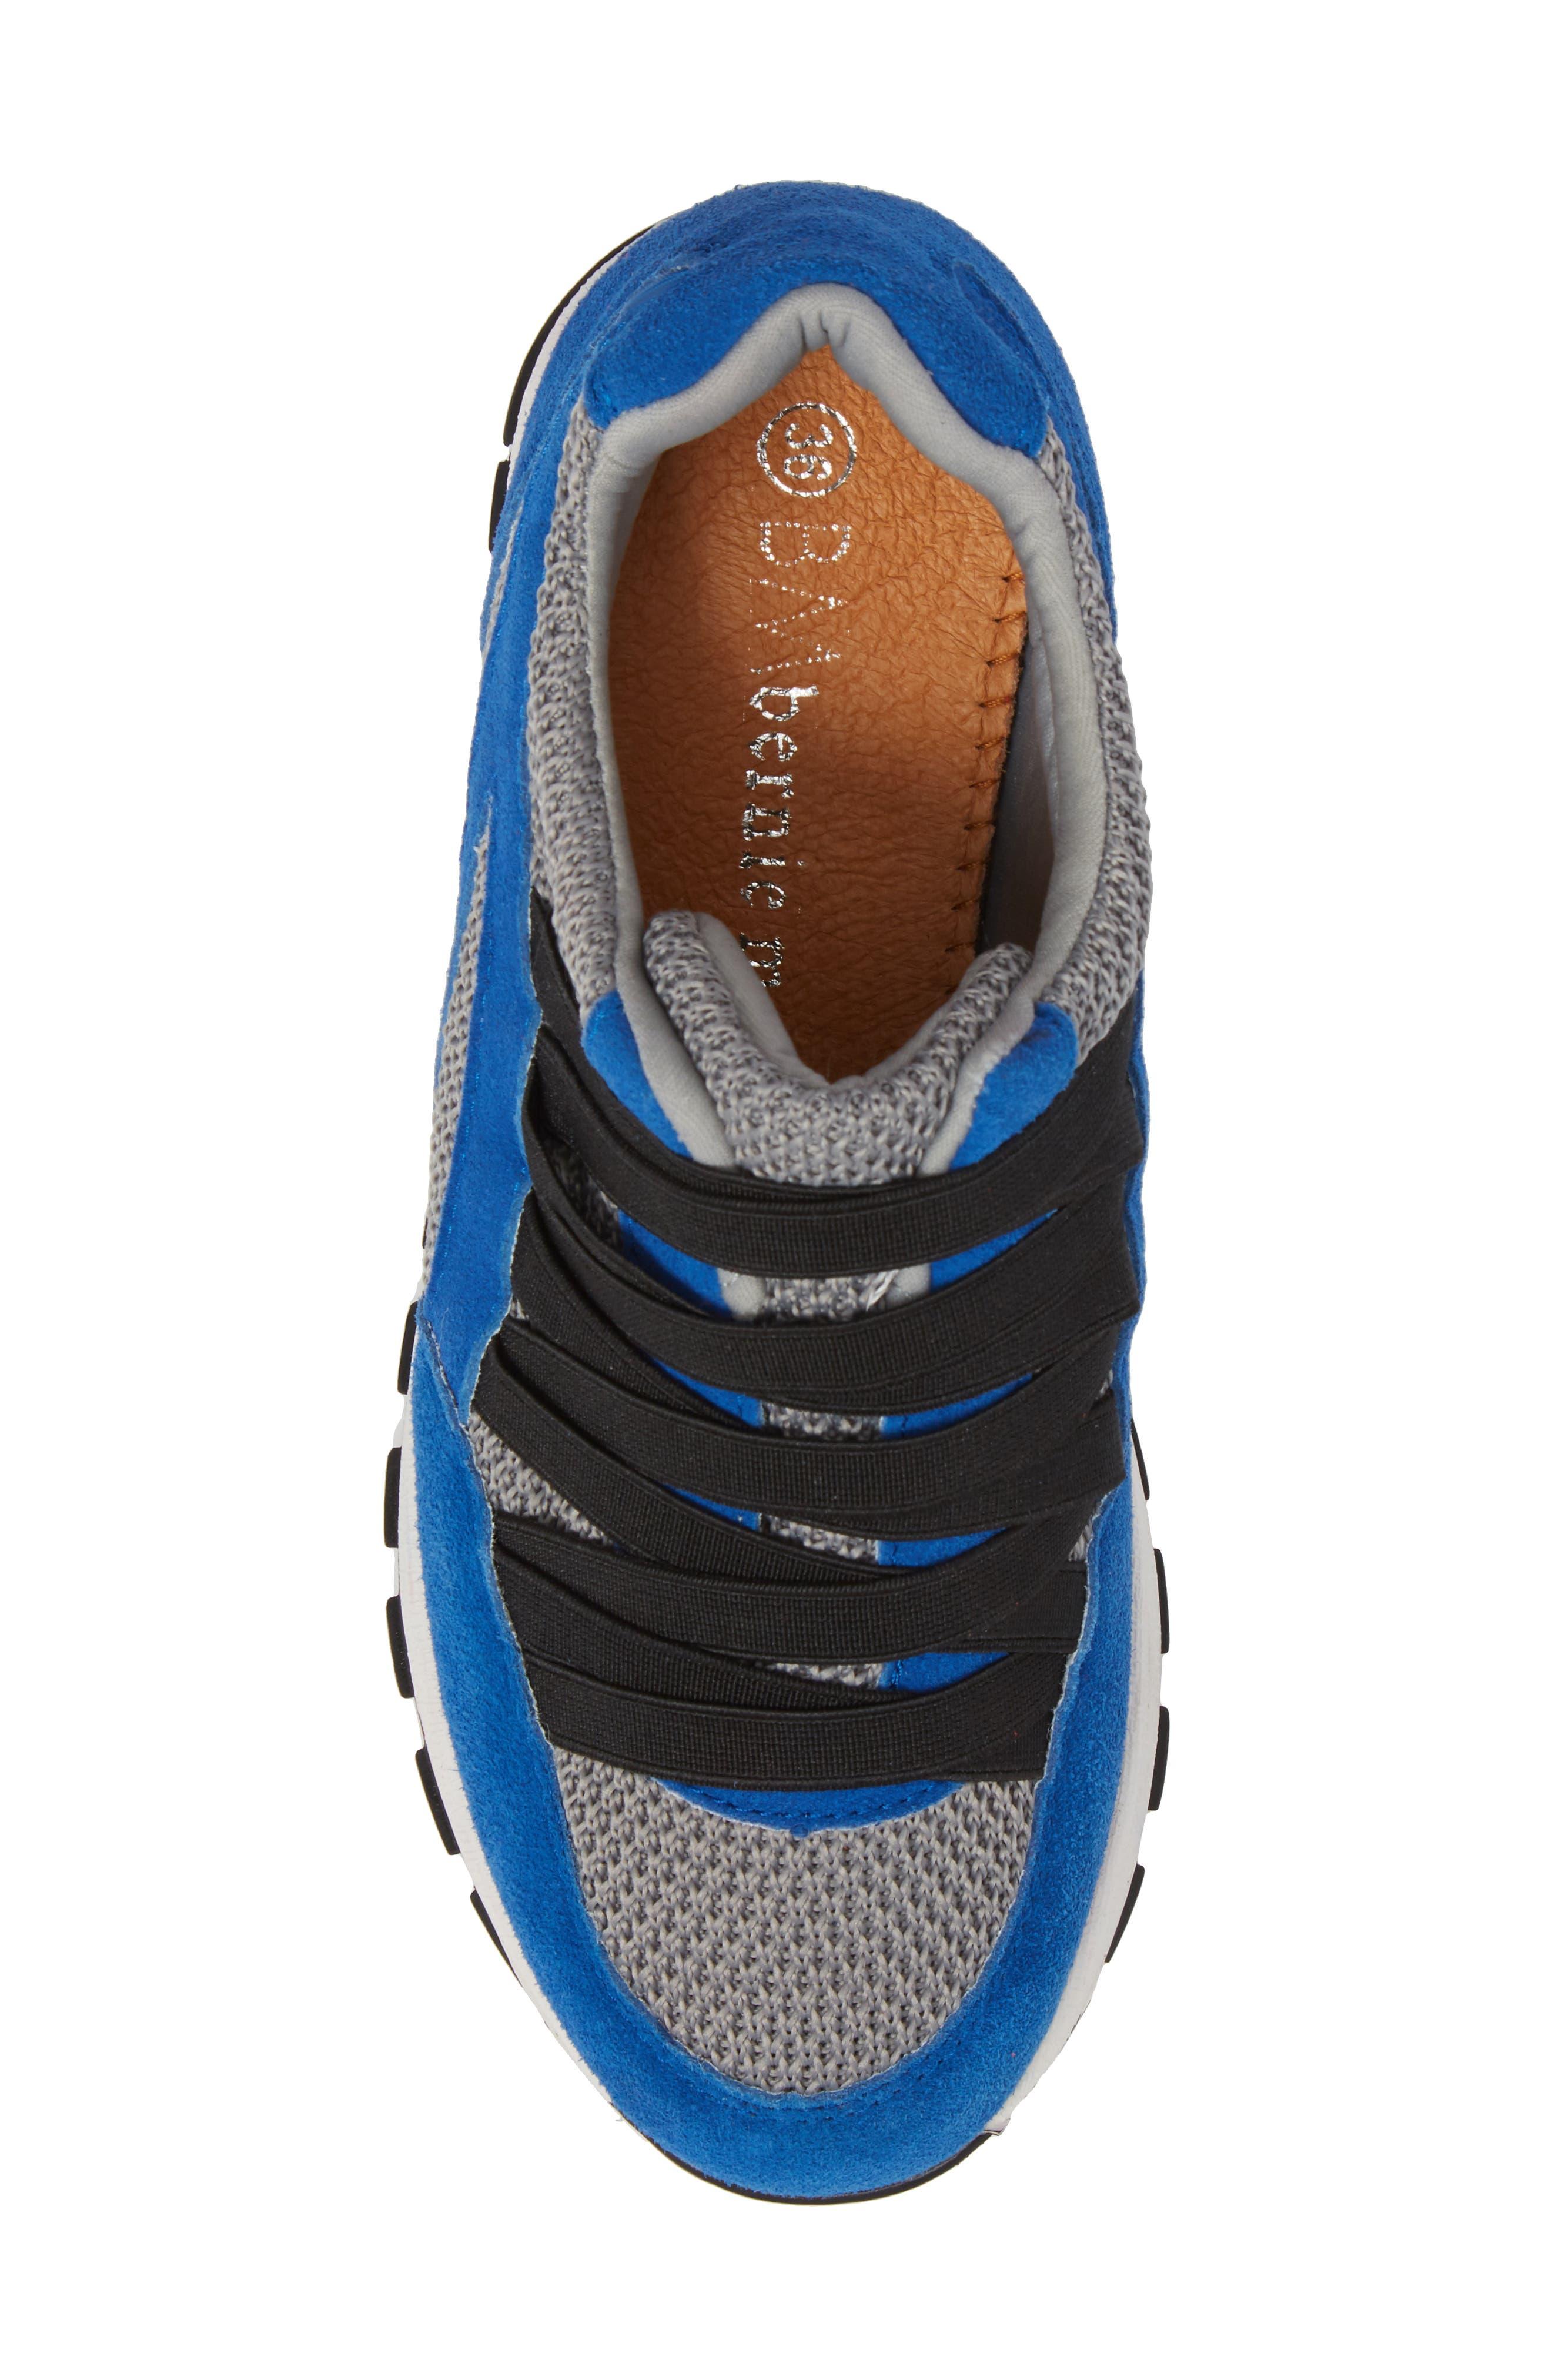 BERNIE MEV., Bernie Mev Tara Cano Sneaker, Alternate thumbnail 5, color, ROYAL BLUE/ GREY FABRIC